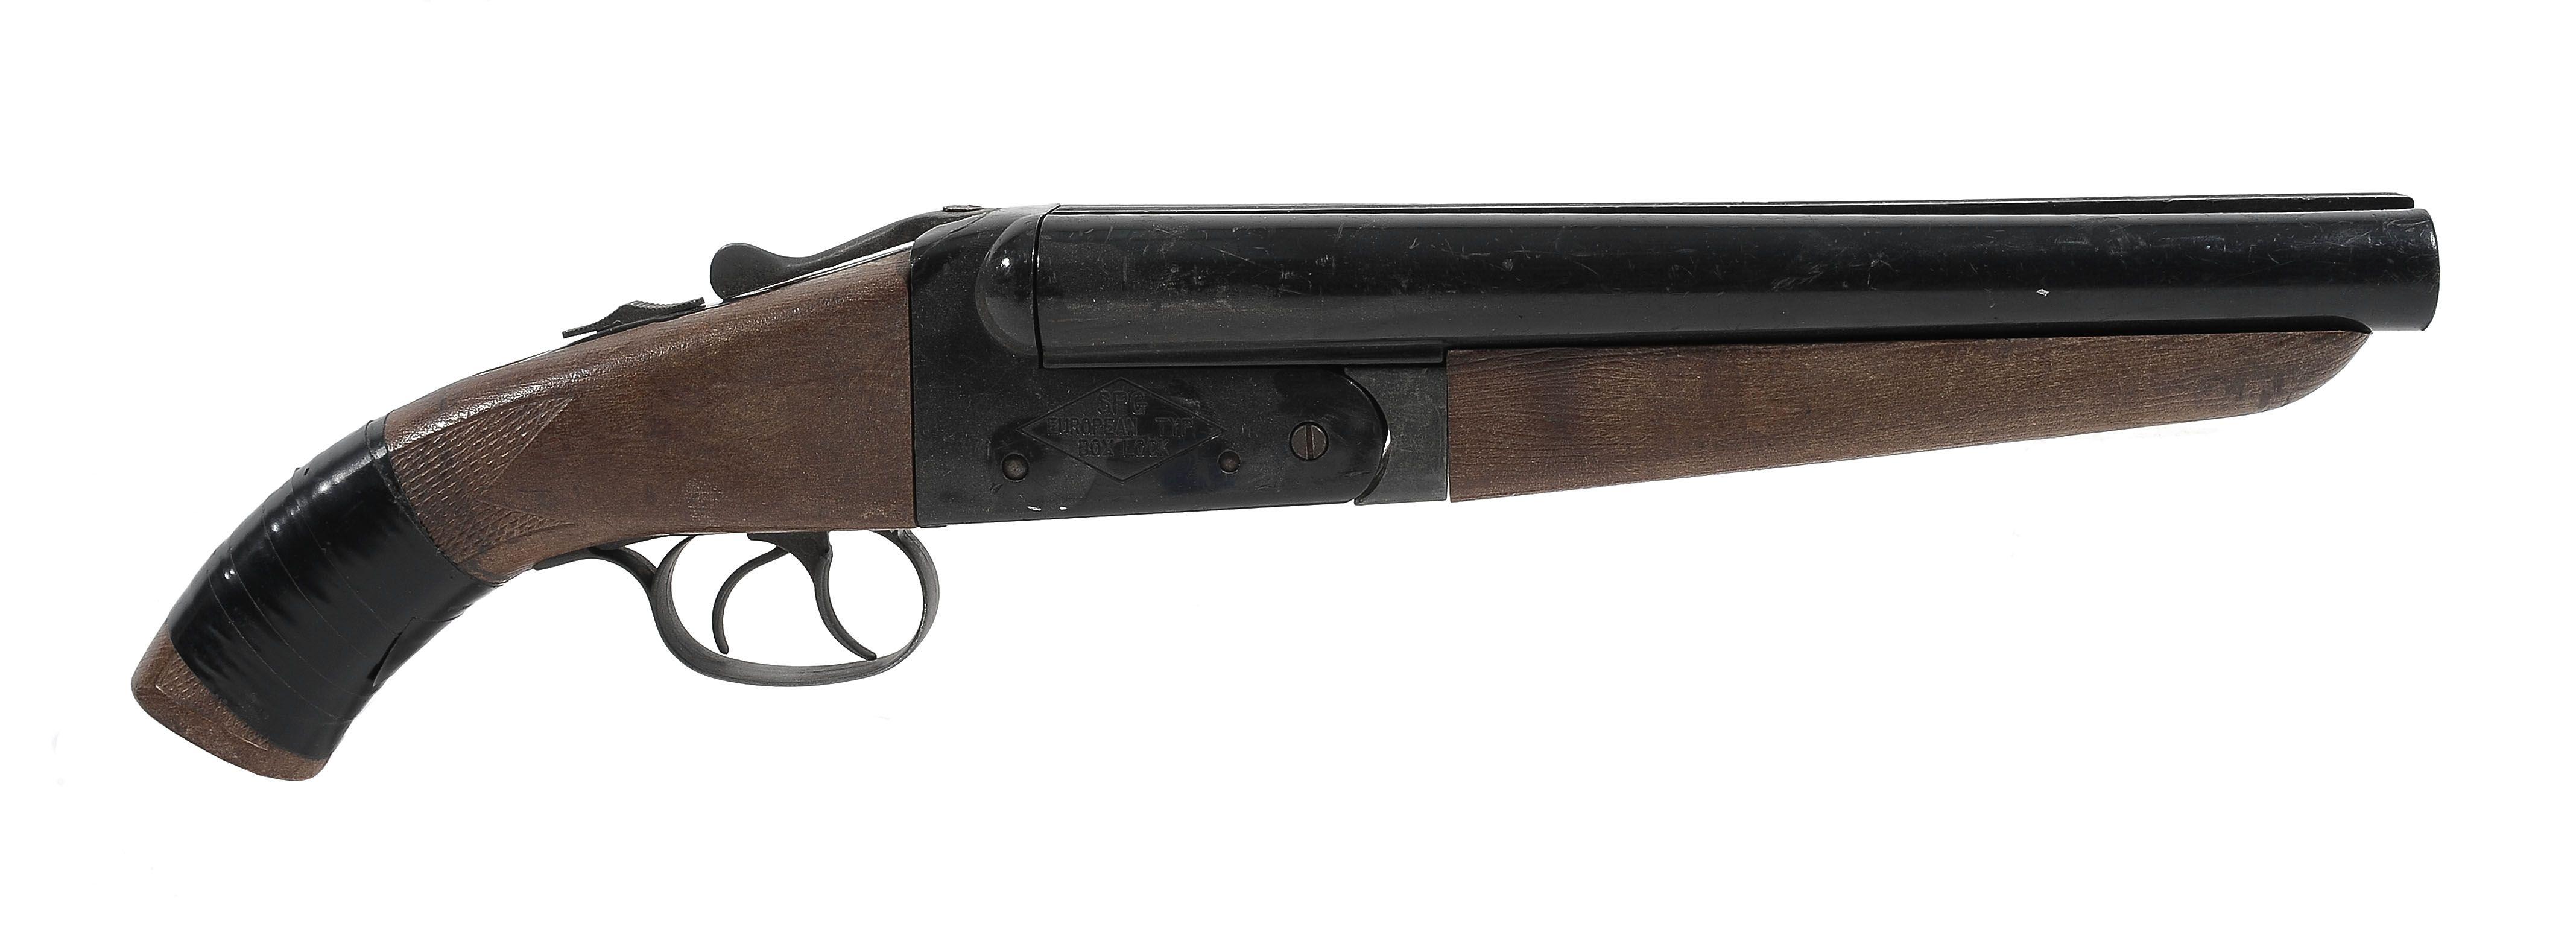 double barrel shotgun - Google Search | Something awesome | Pinterest | Double barrel, Shotguns ...